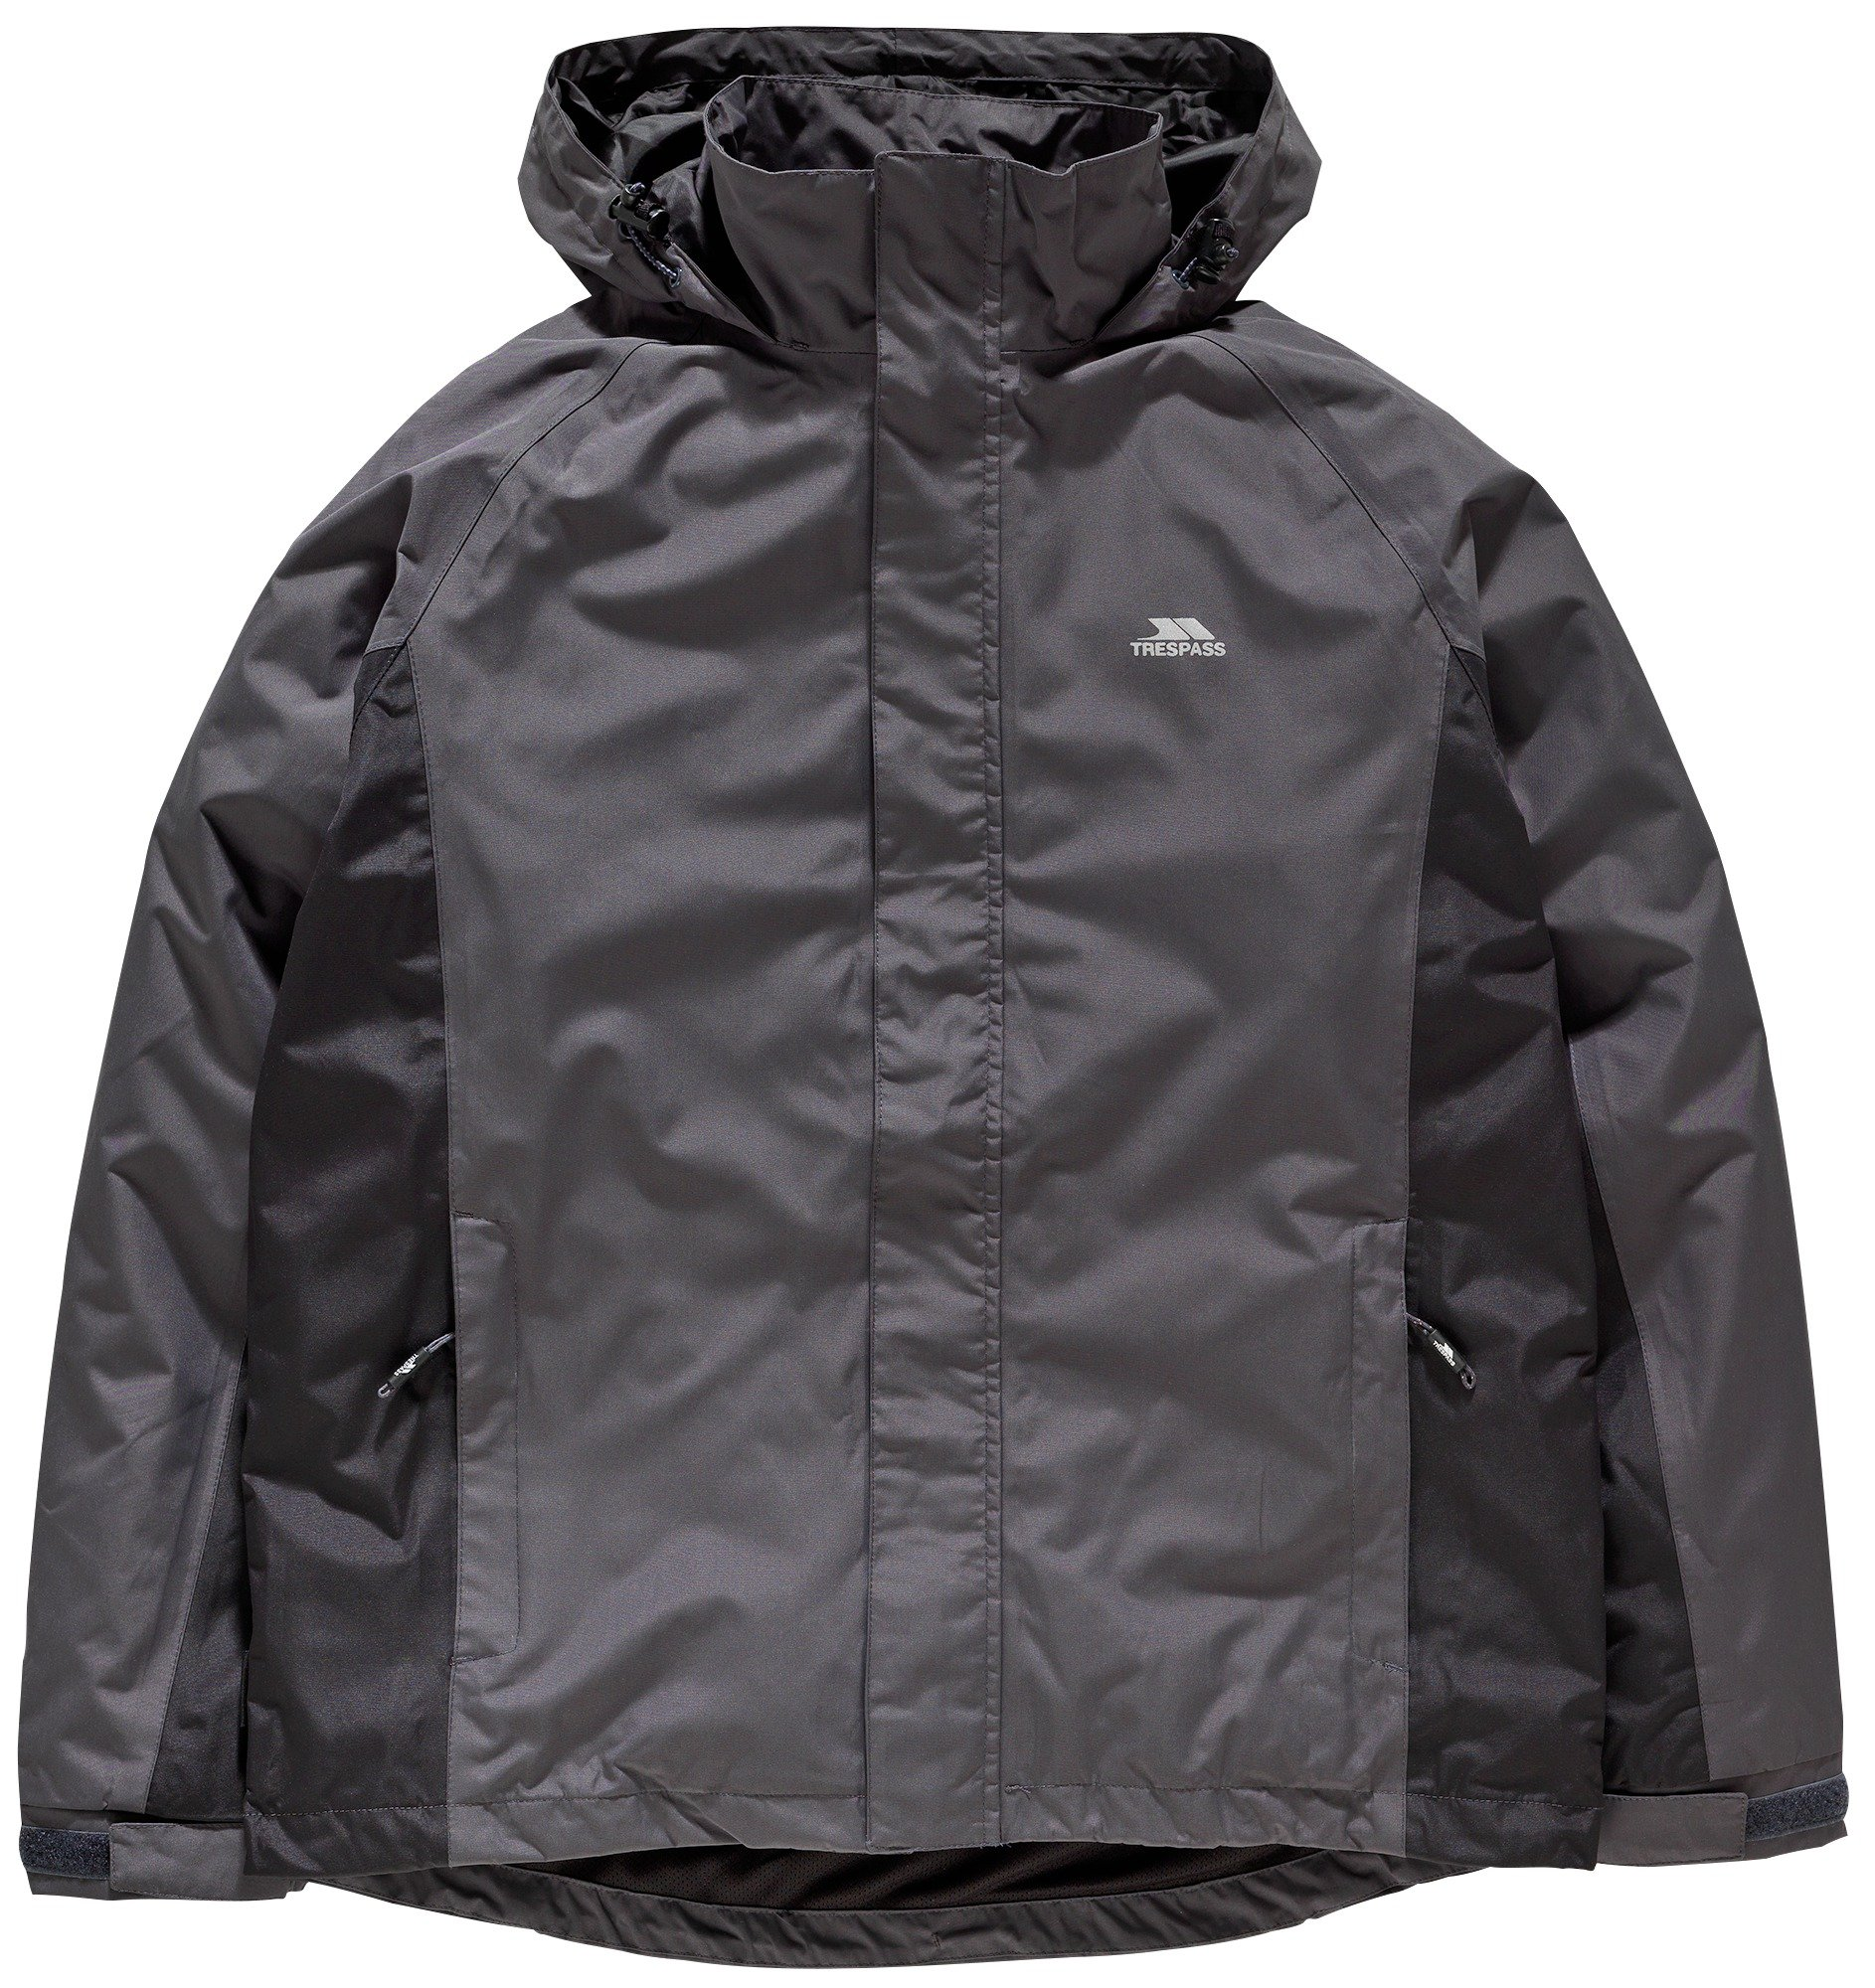 Image of Trespass Grey Rogan II Jacket - Small